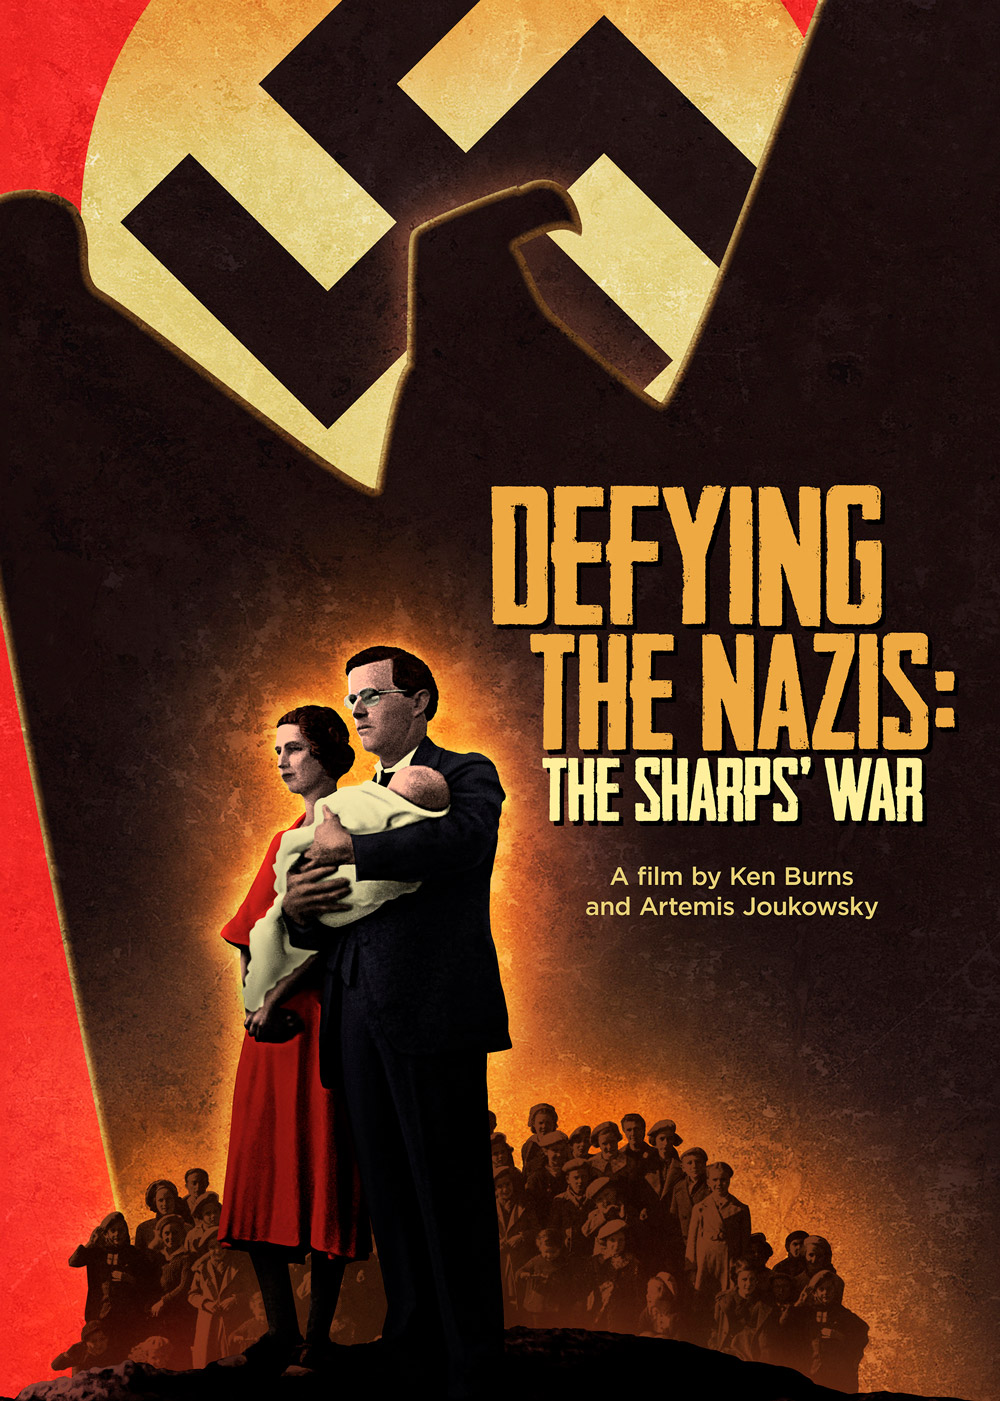 Defying the Nazis key art